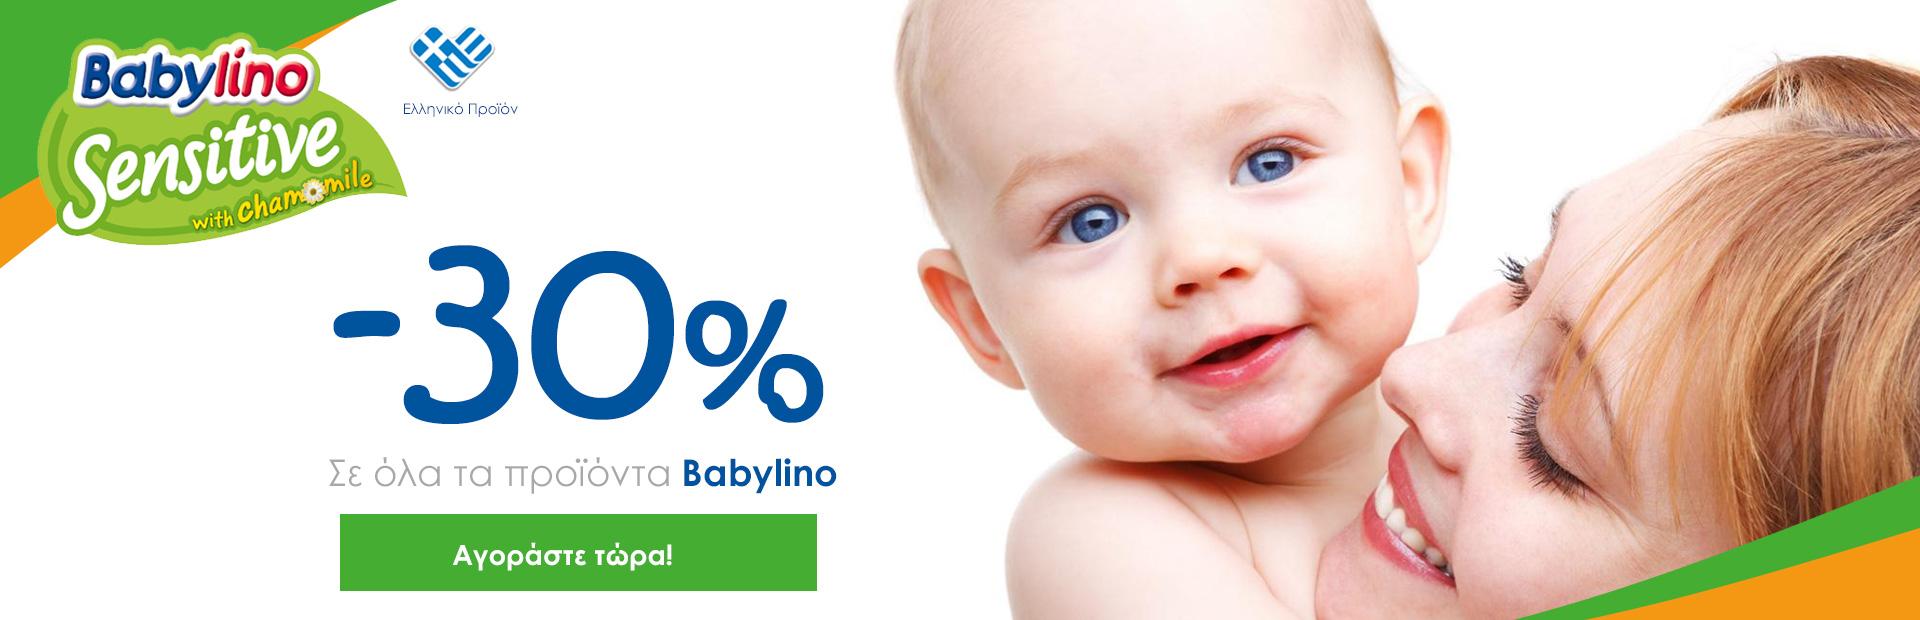 Babylino -30%